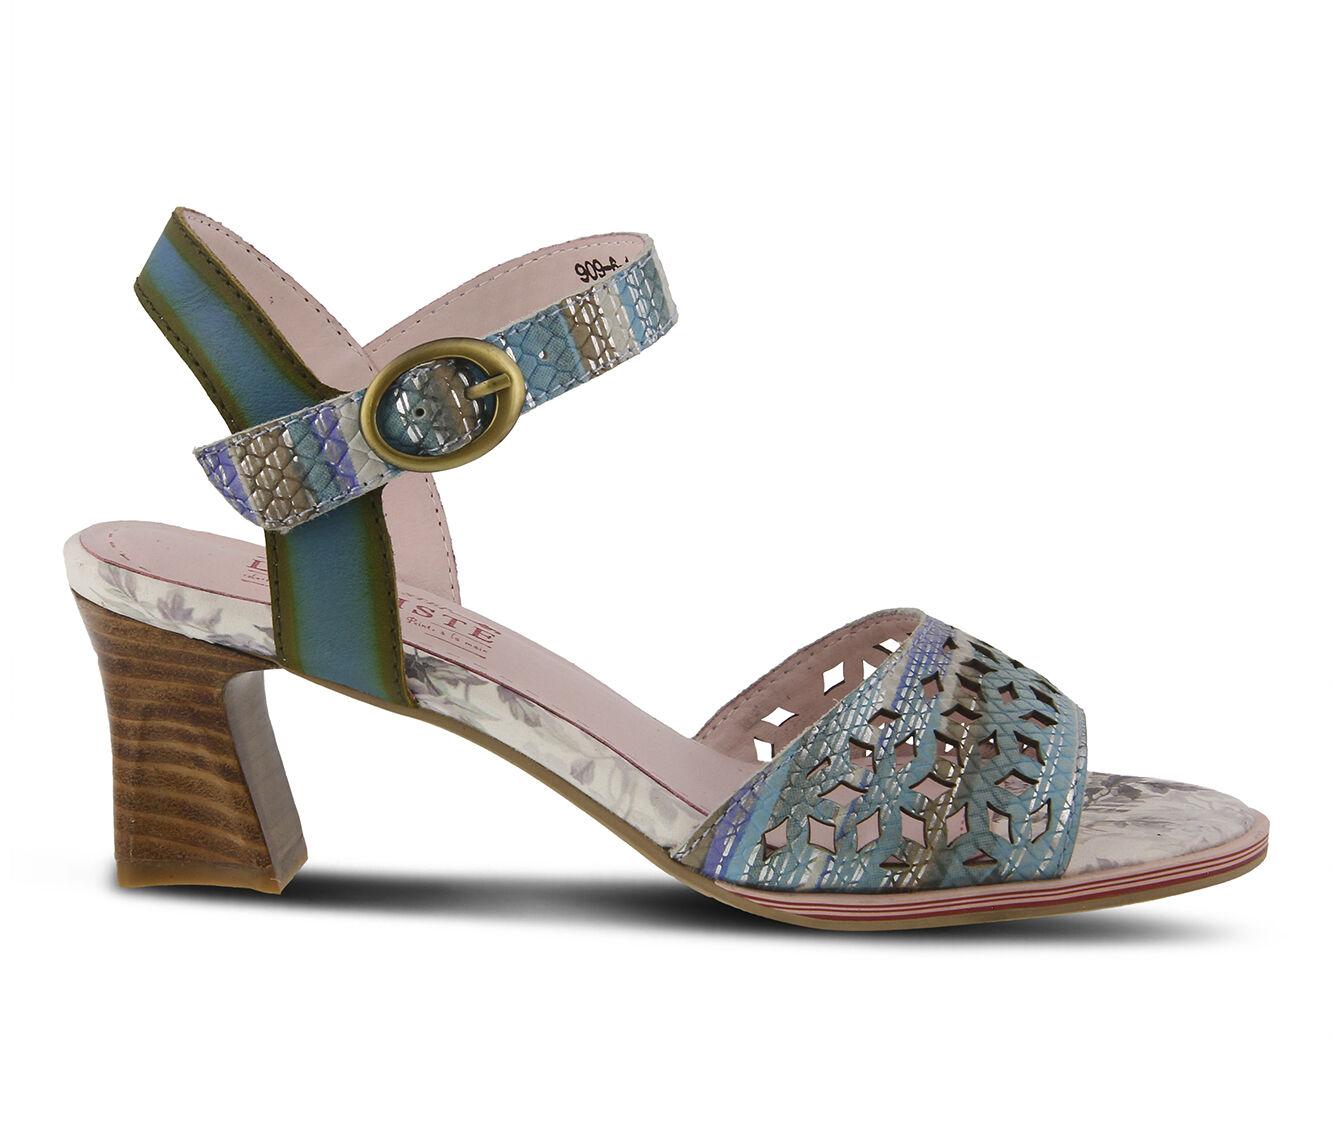 uk shoes_kd6854